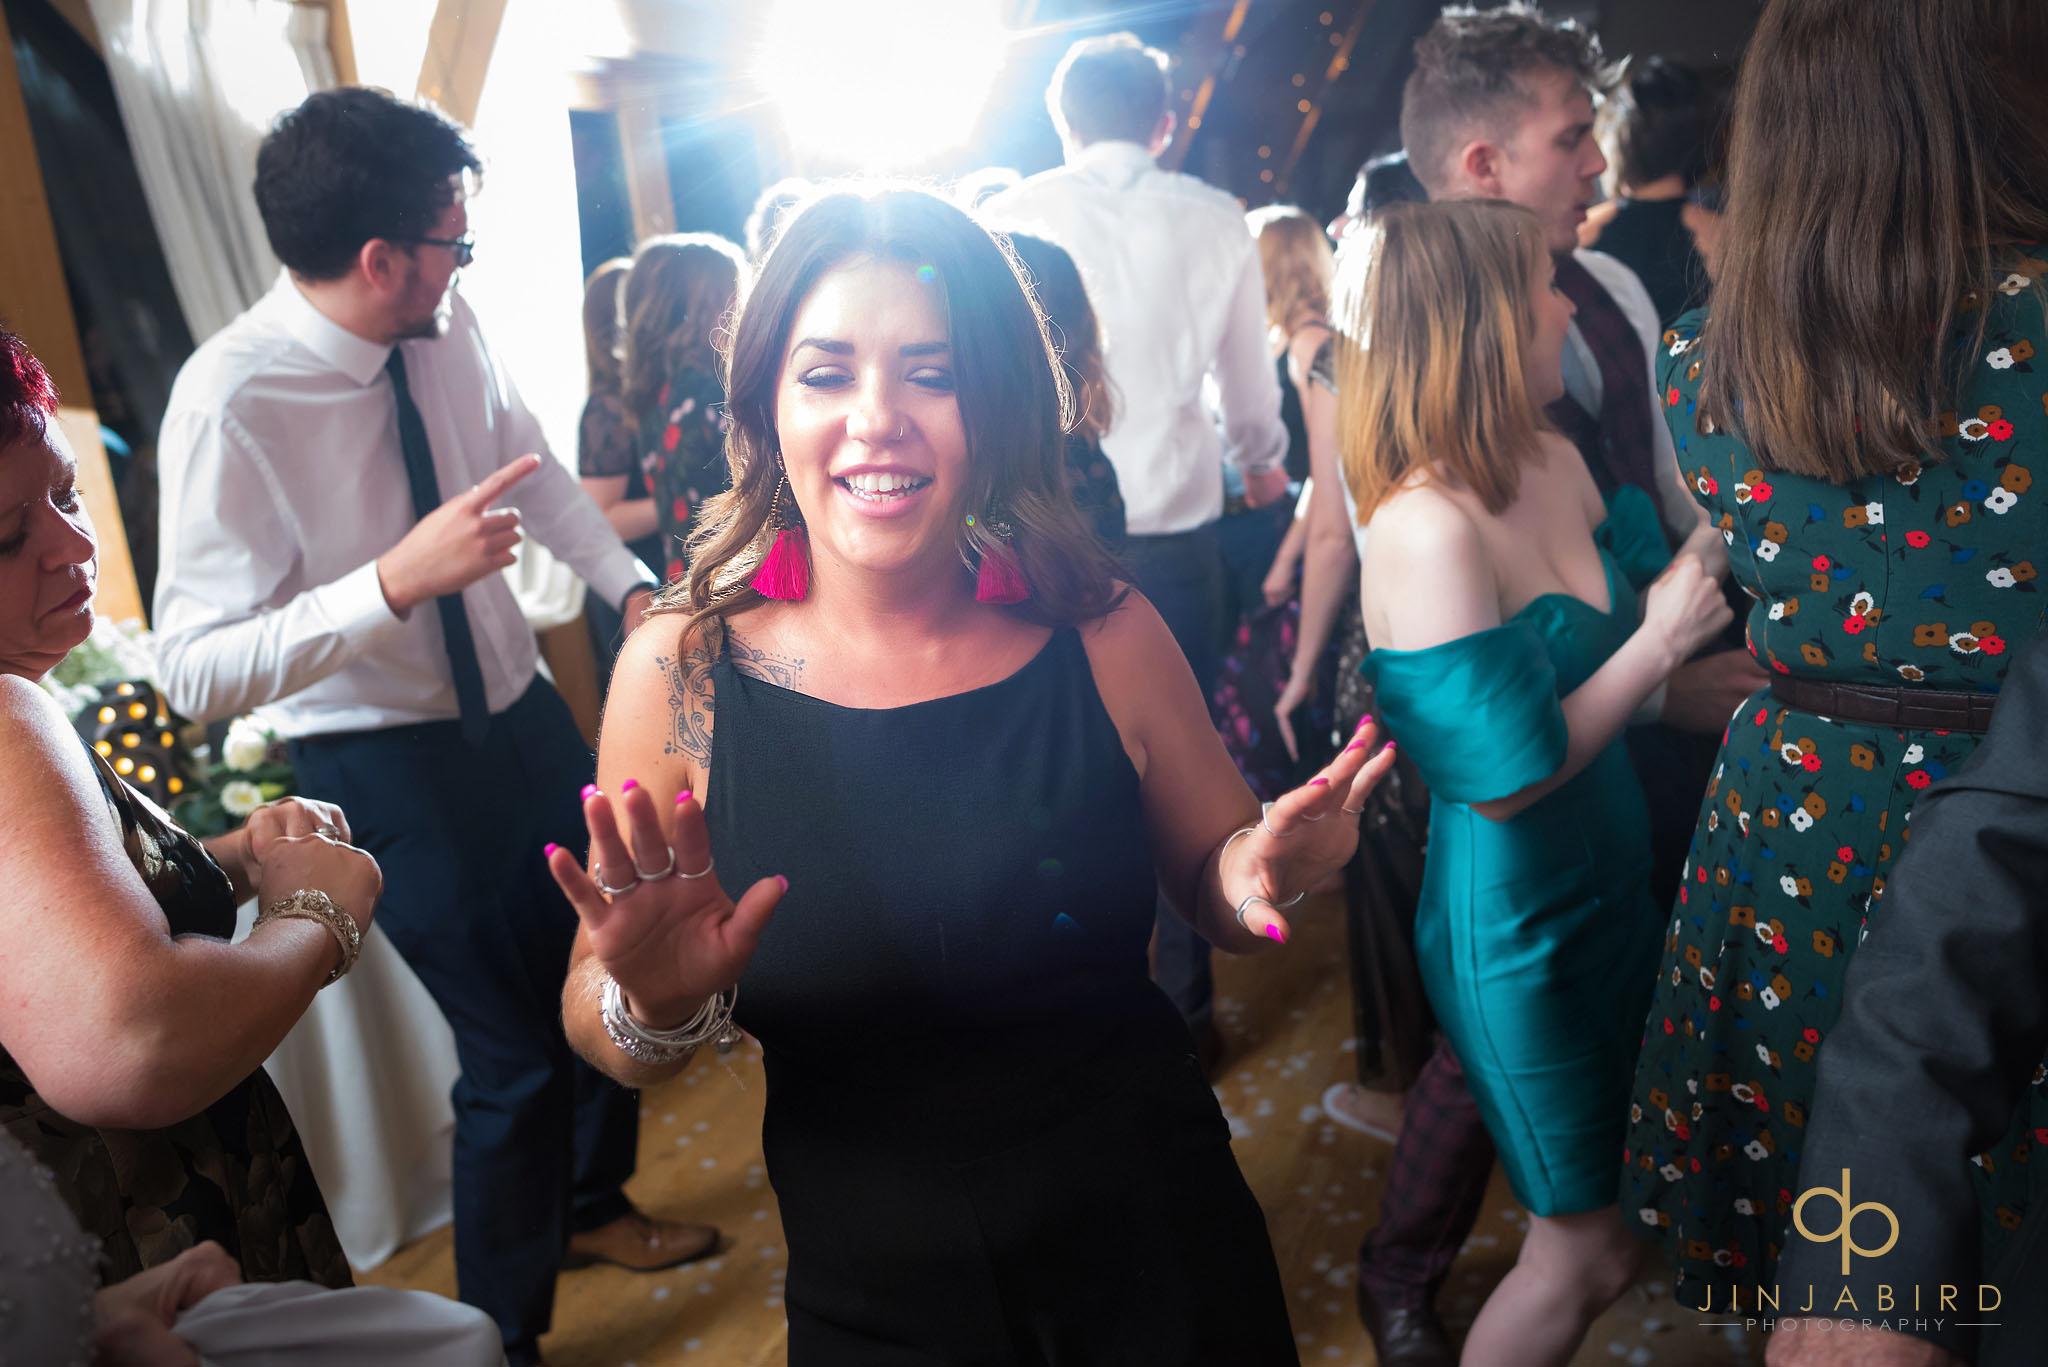 wedding guest dancing at wedding